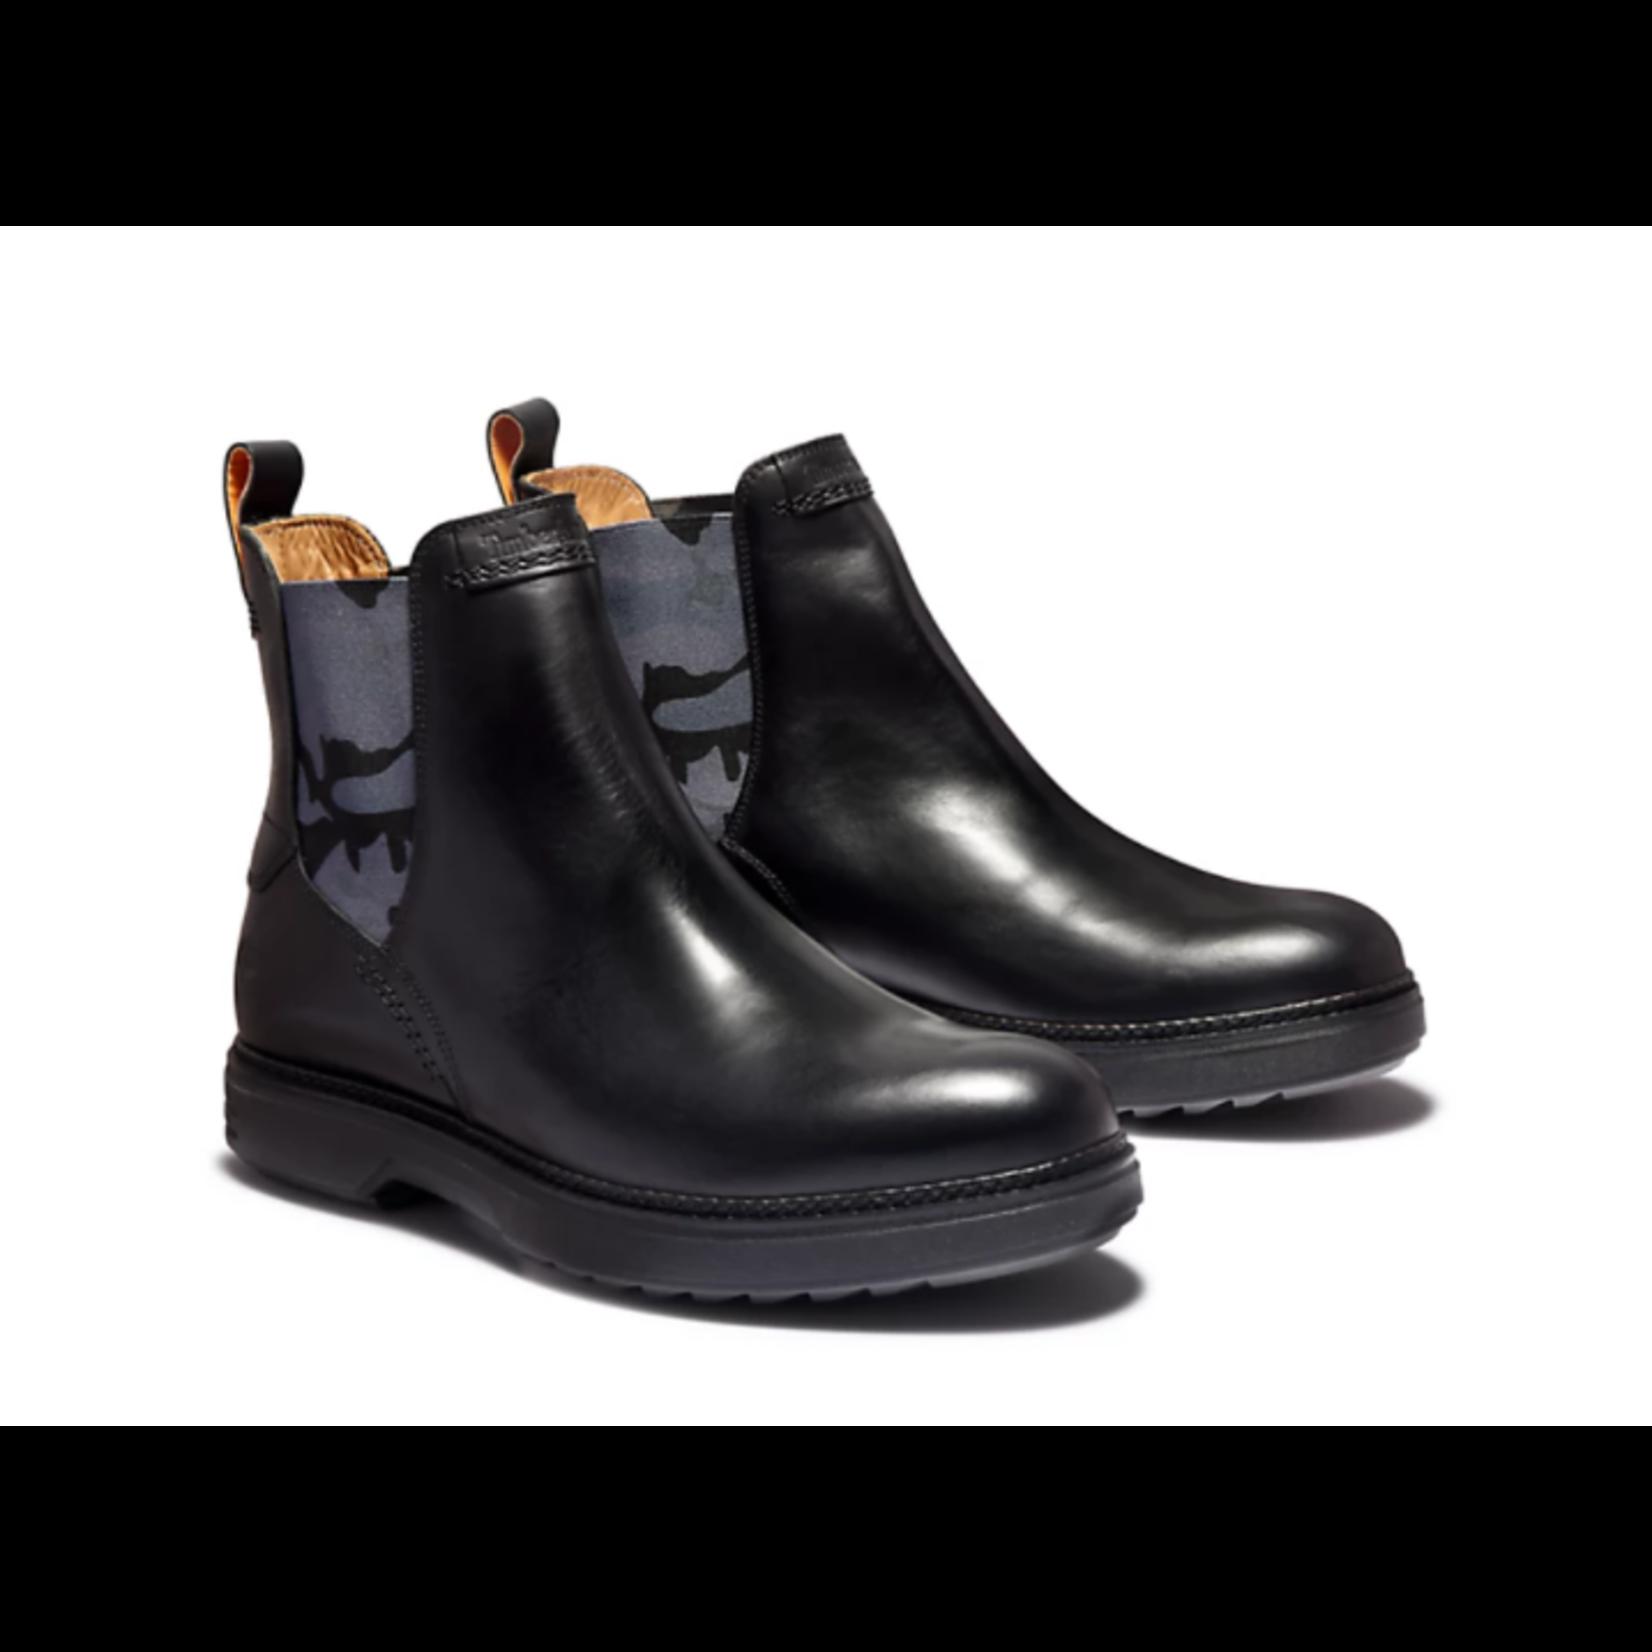 Timberland RR 4610 CHELSEA BOOT FOR MEN IN BLACK